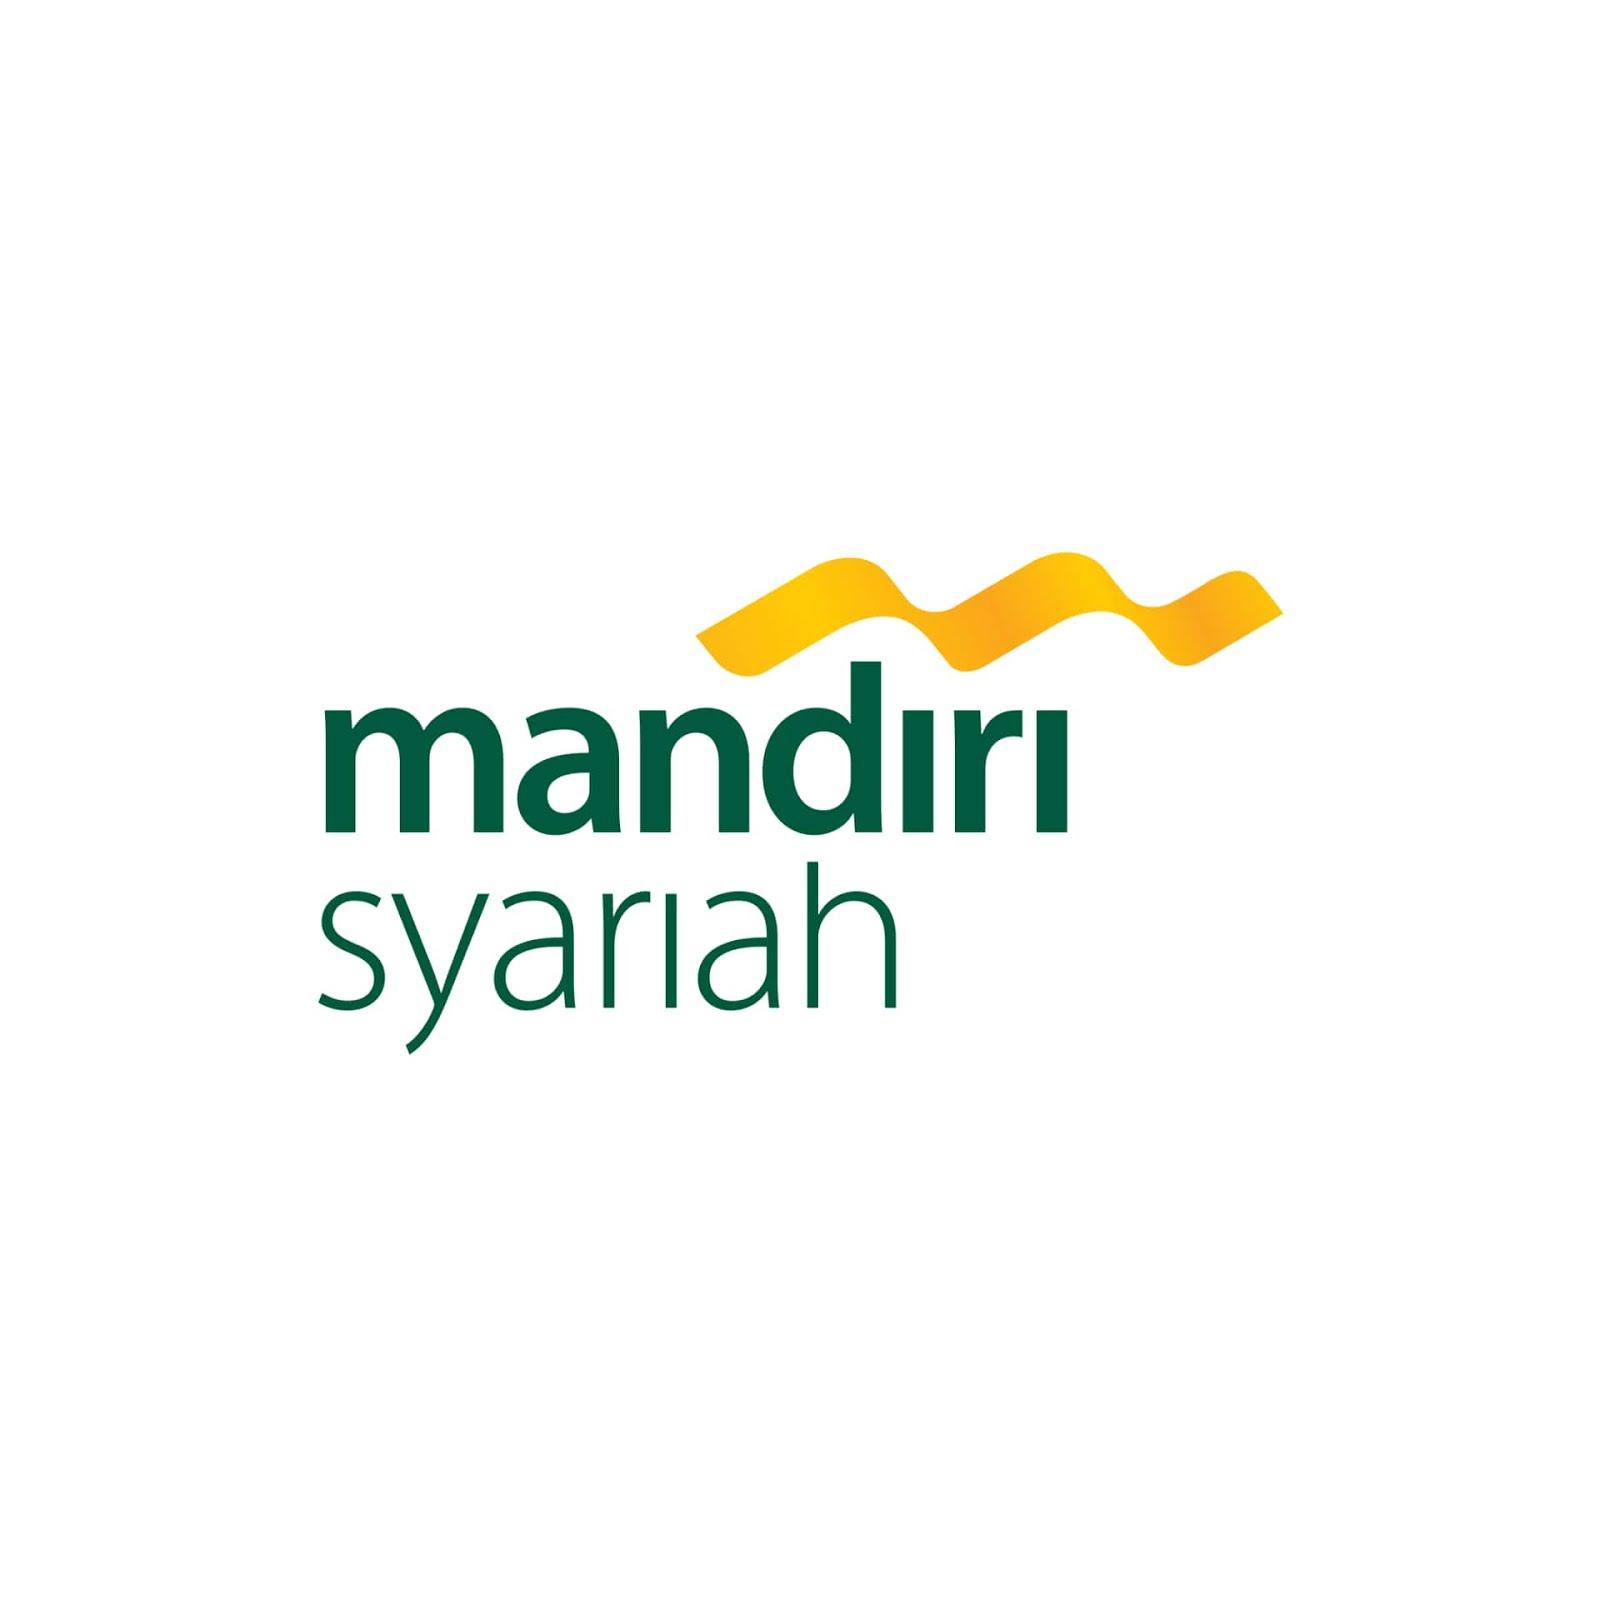 Lowongan Kerja Fresh Graduate Sma Smk Bank Mandiri Syariah Terbaru Ruangankerja